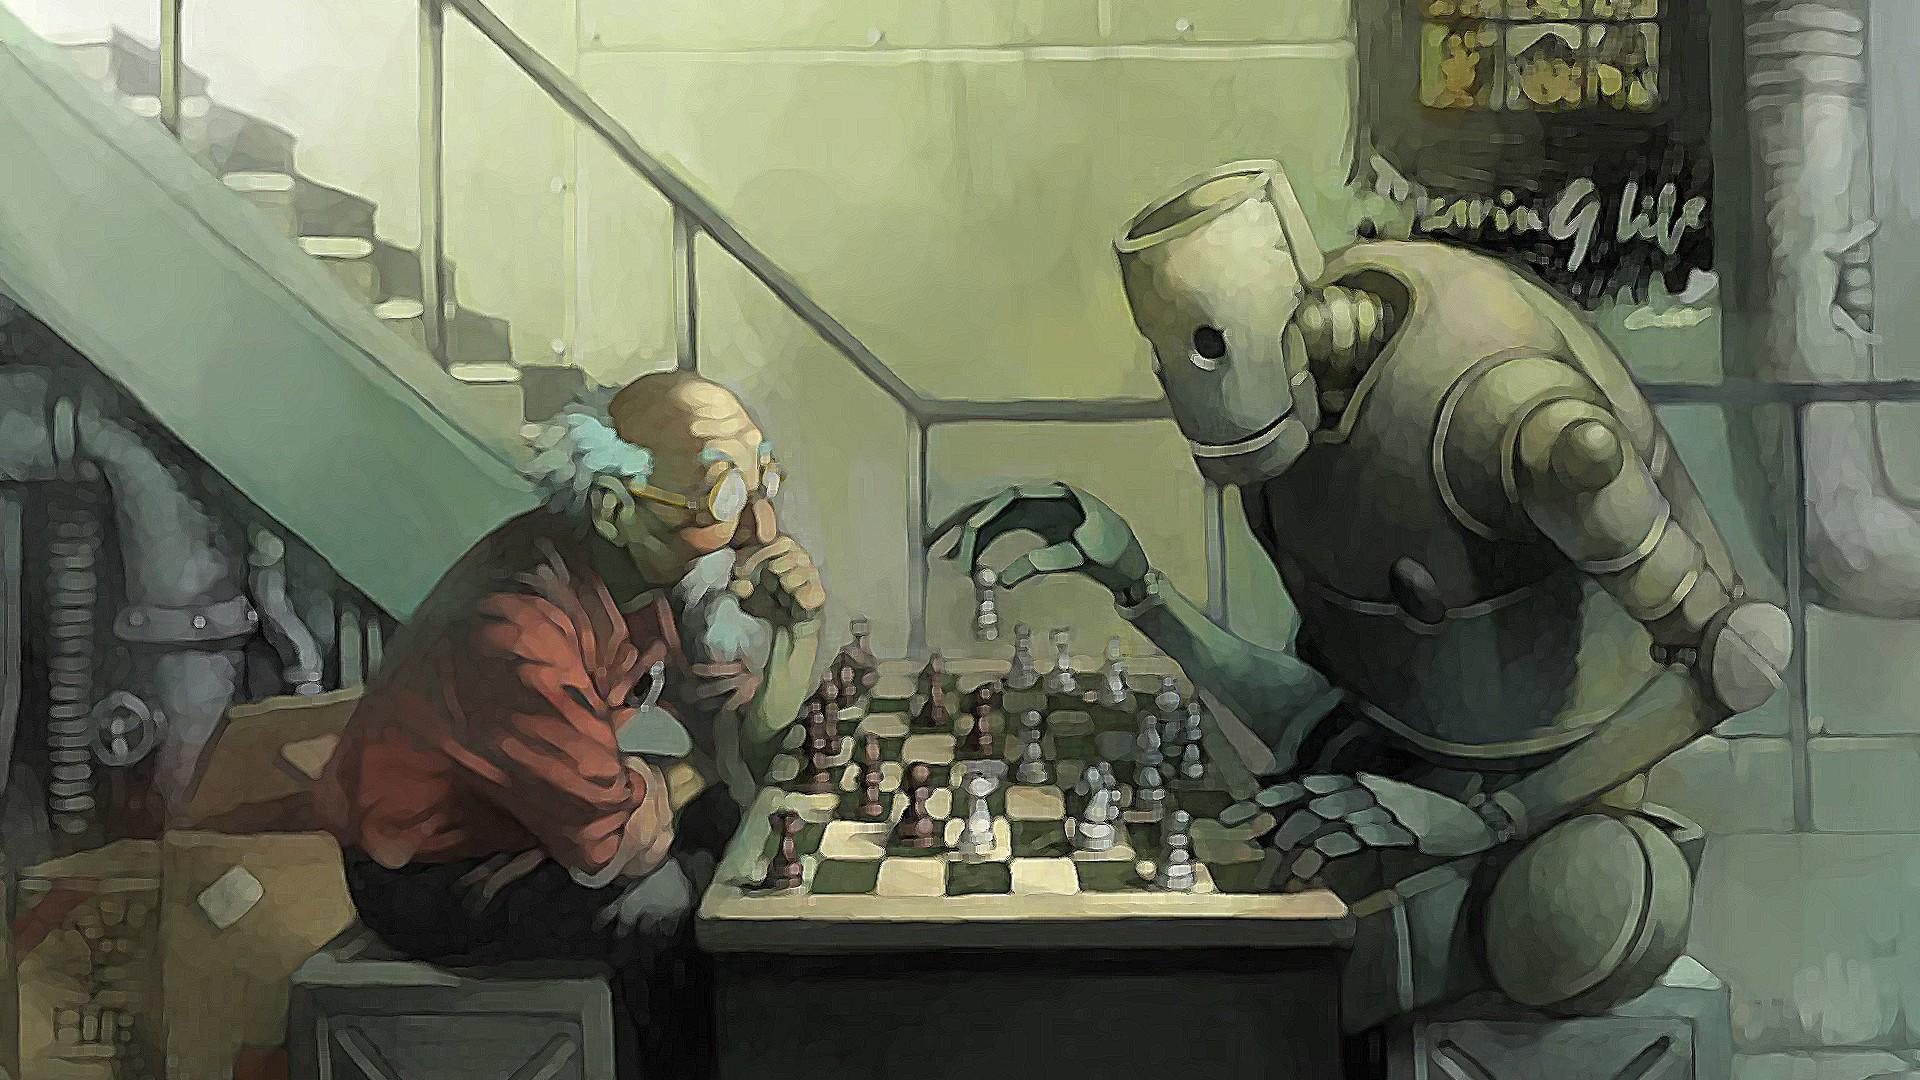 Zastaki.com - Chess, robots, grandfather, boxes